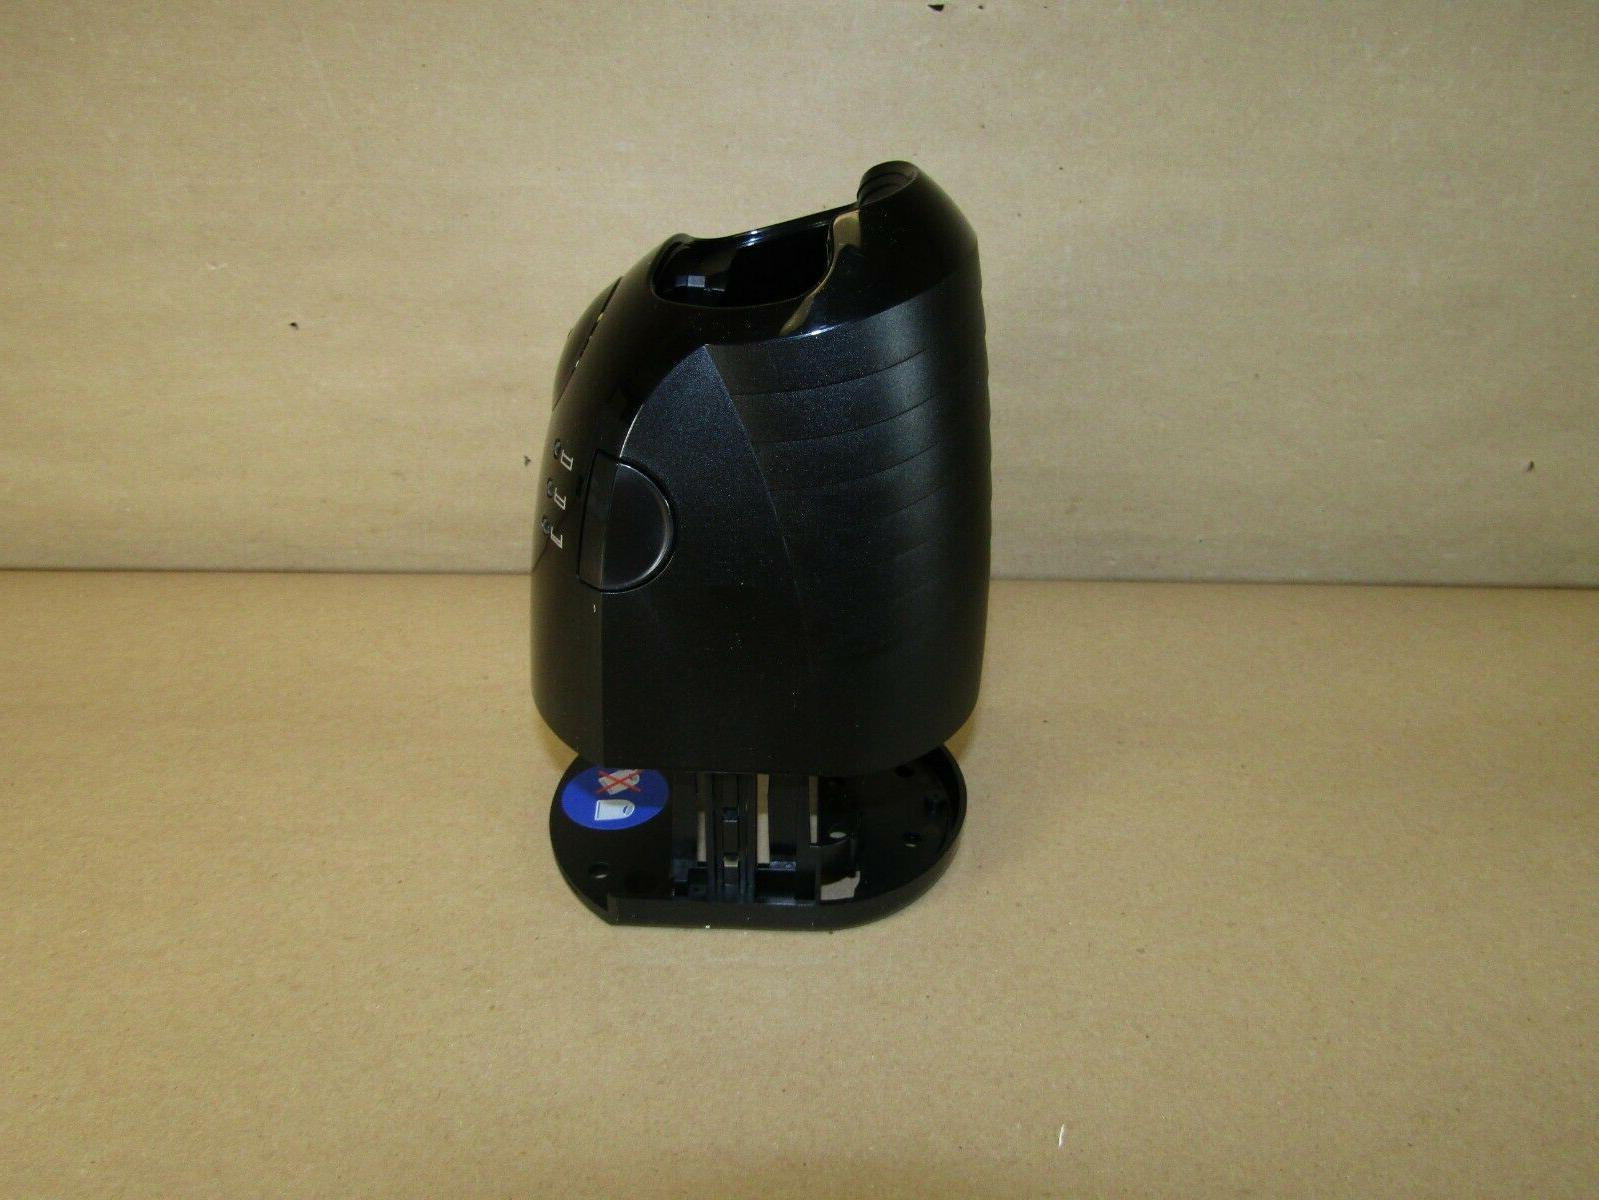 Braun 790cc Men's Foil Shaver, Rechargeable and Cordless